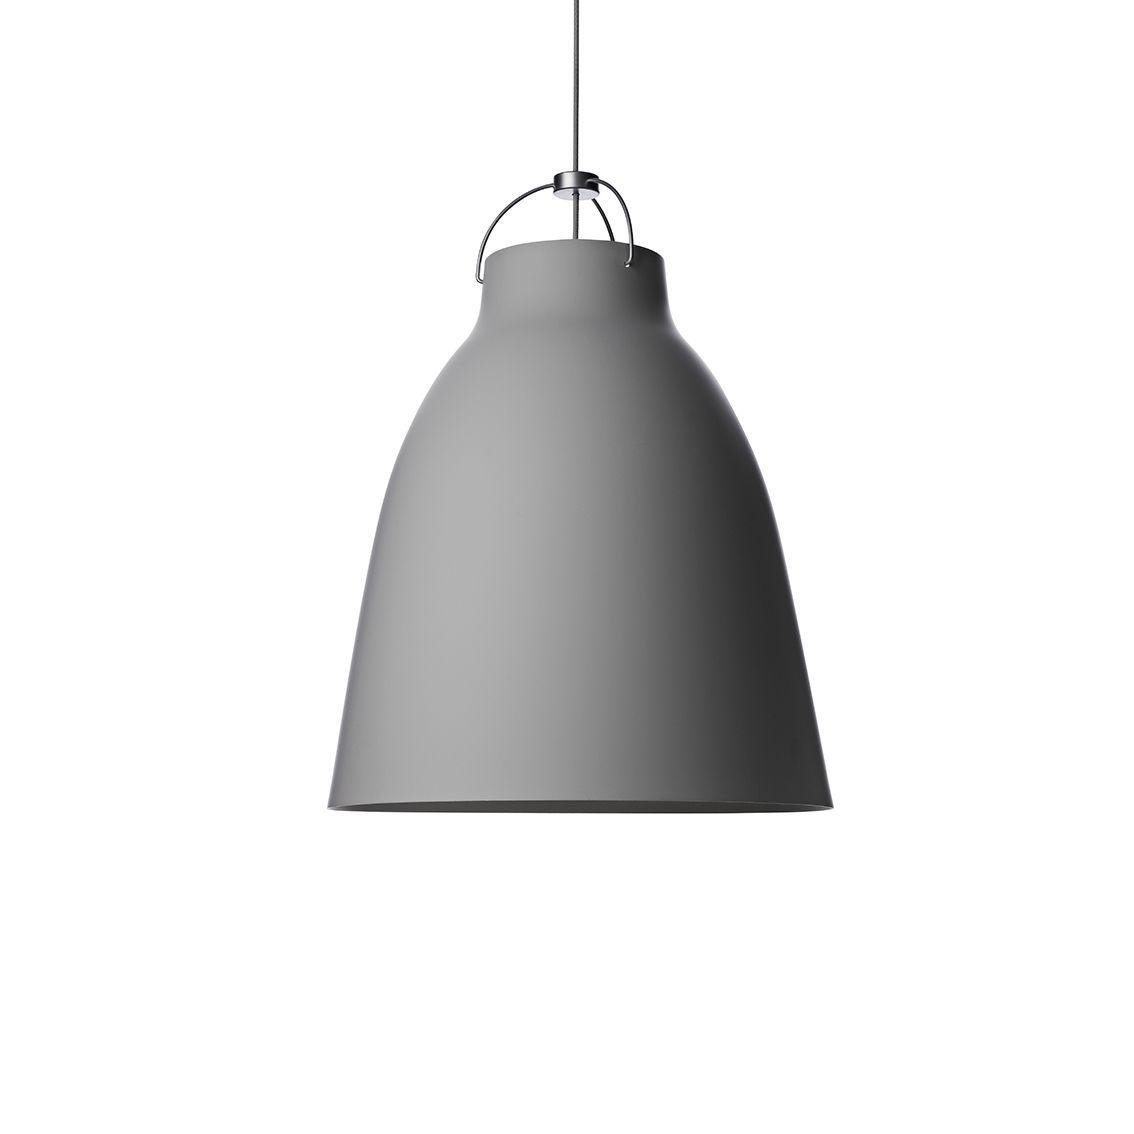 Caravaggio hanglamp Lightyears Ø16 mat grijs 45